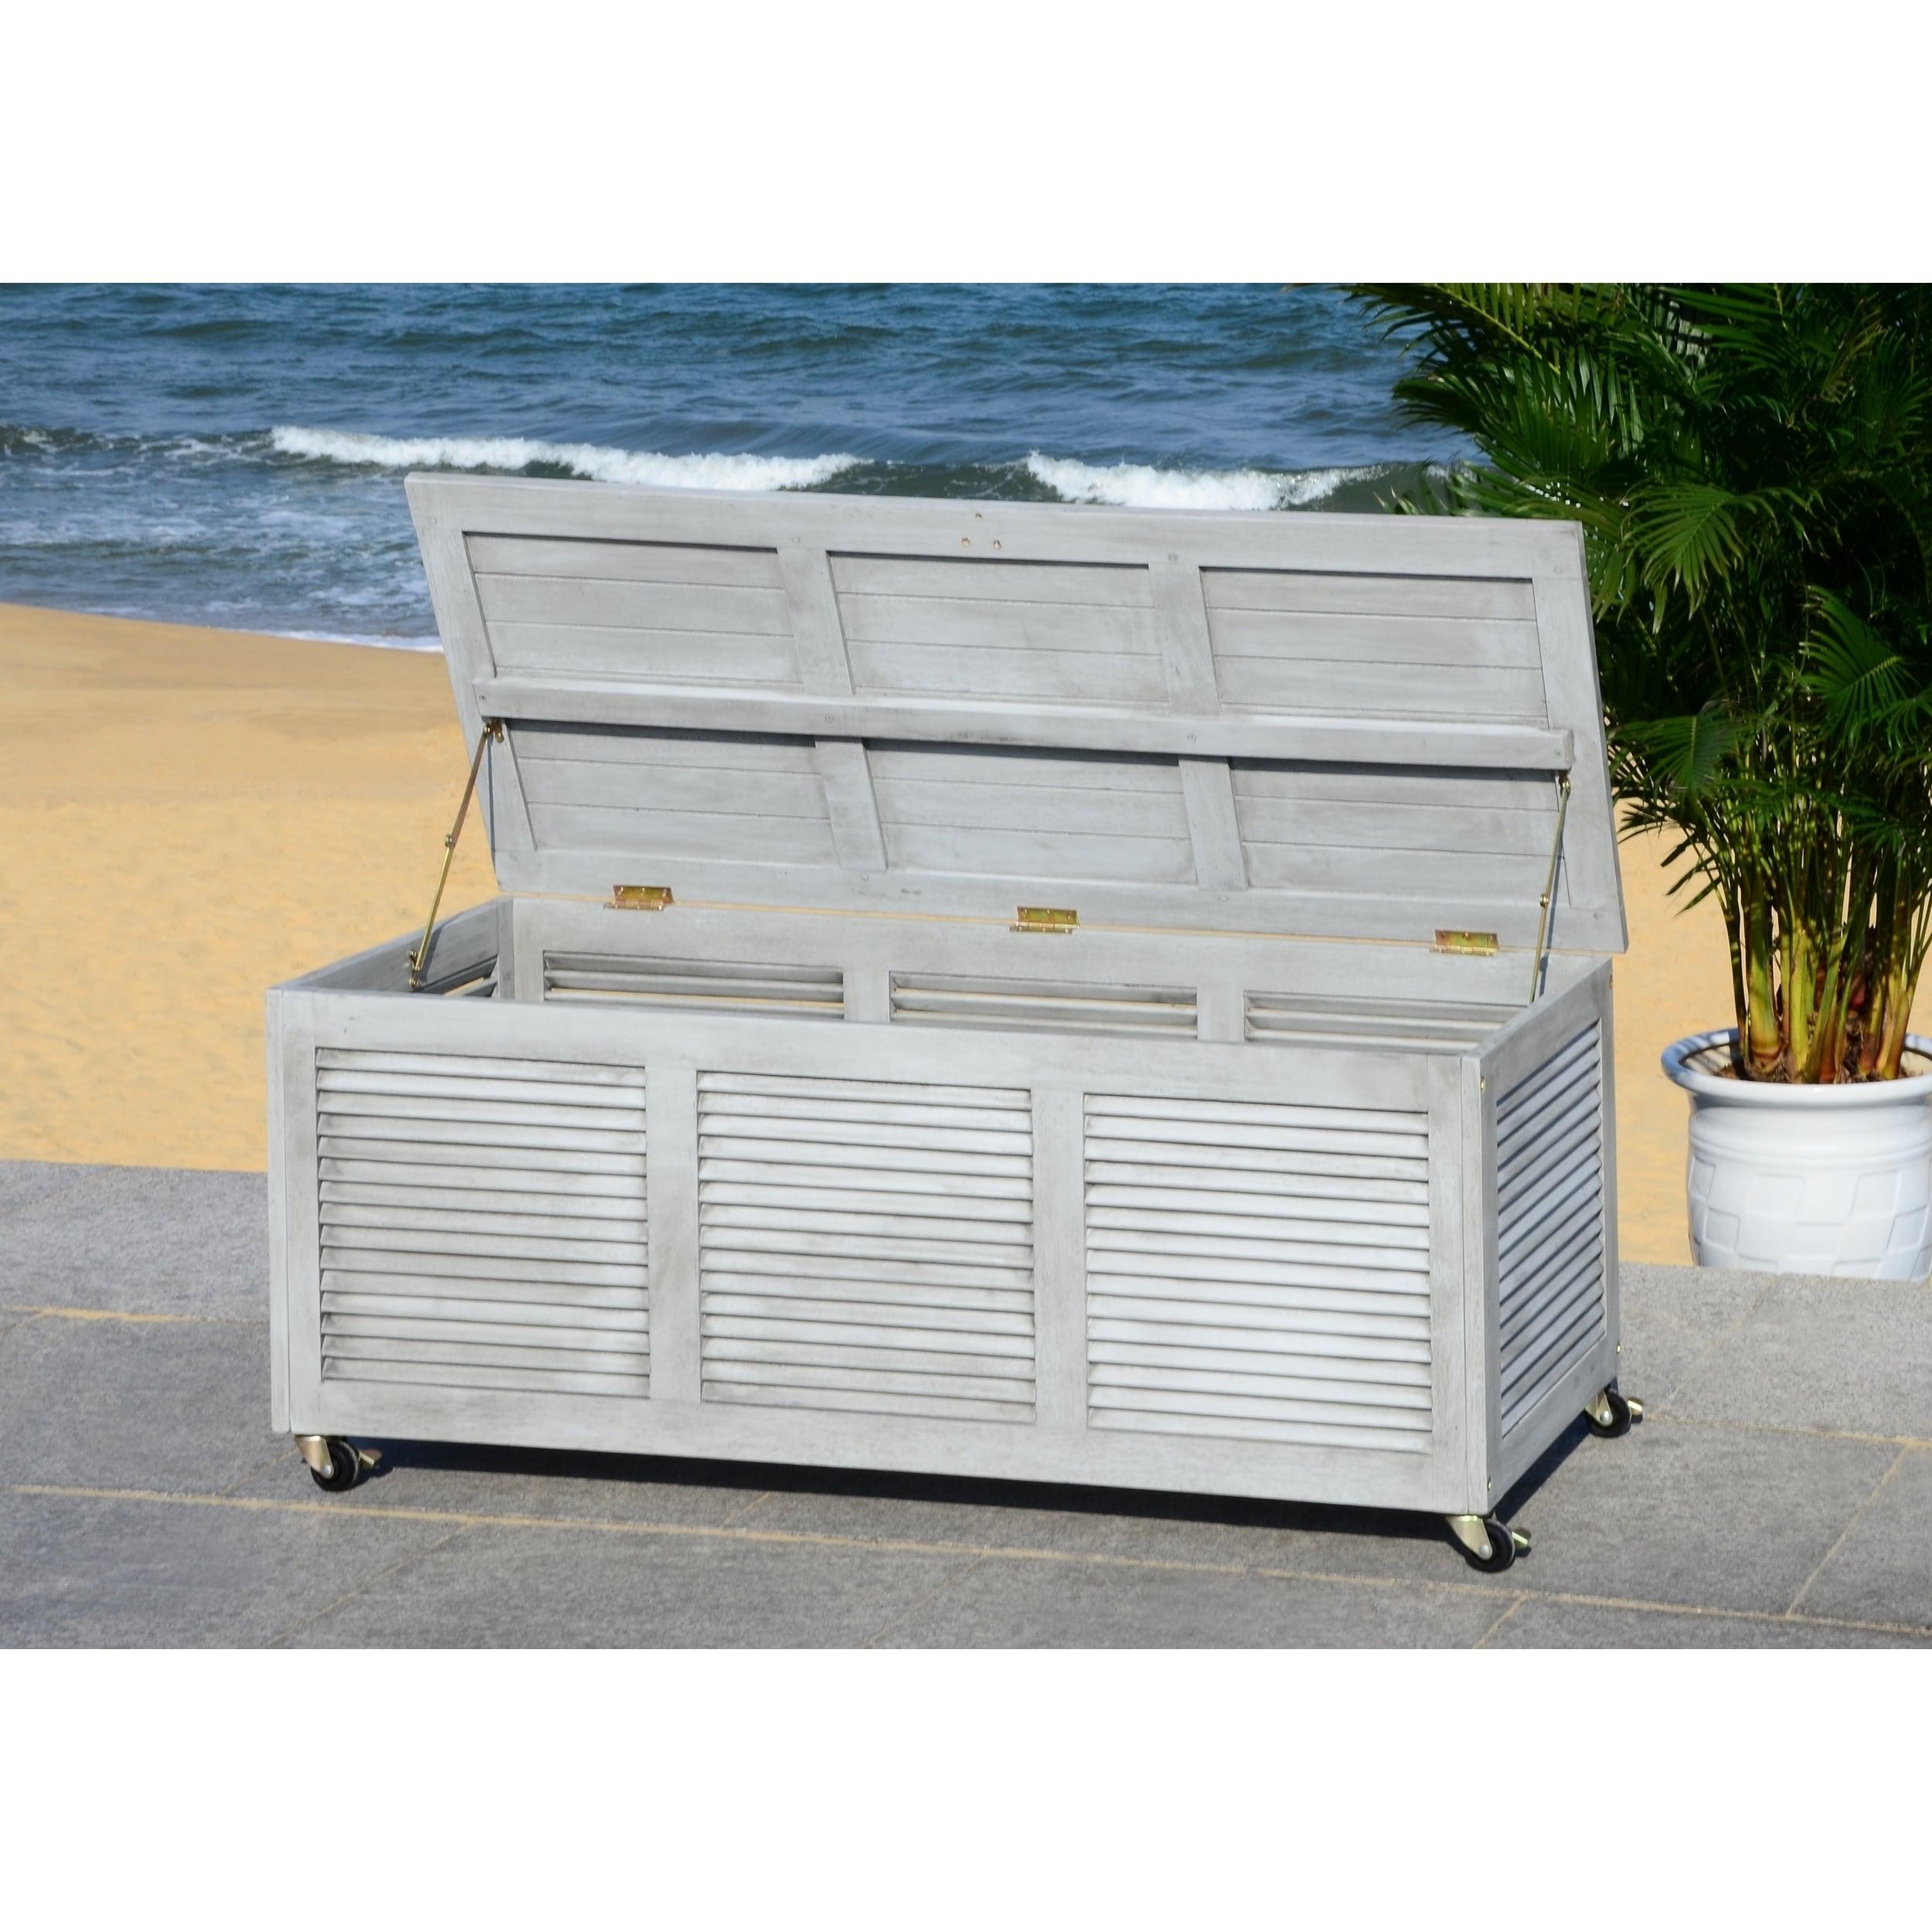 Safavieh Outdoor Elina 47 2 Inch Grey Wash Cushion Storage Box